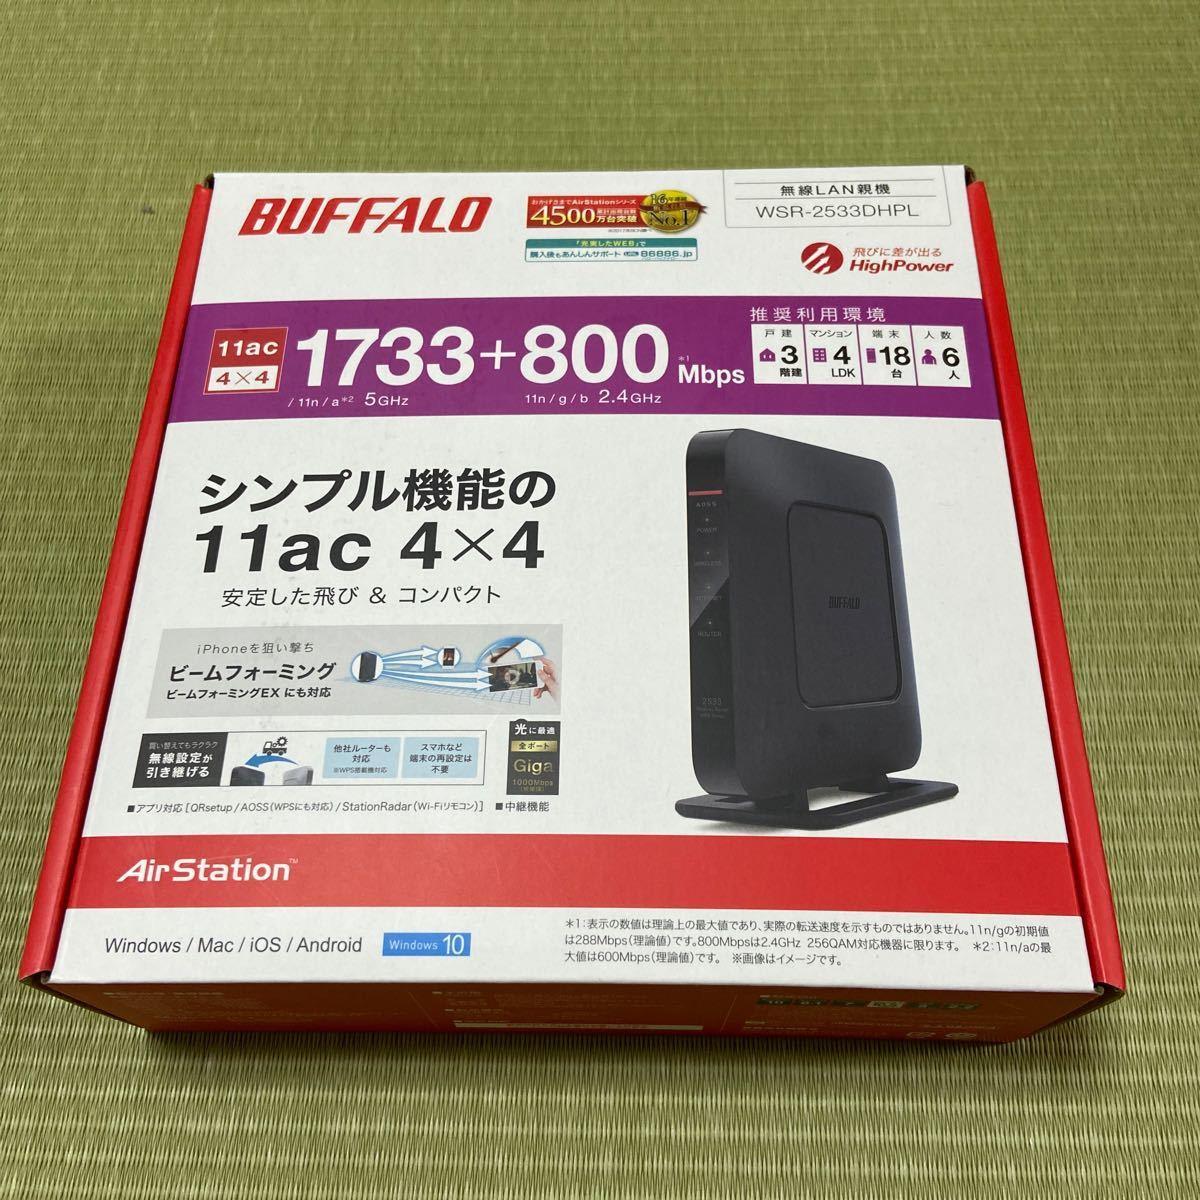 BUFFALO WSR-2533DHPL バッファロー 無線LANルーター